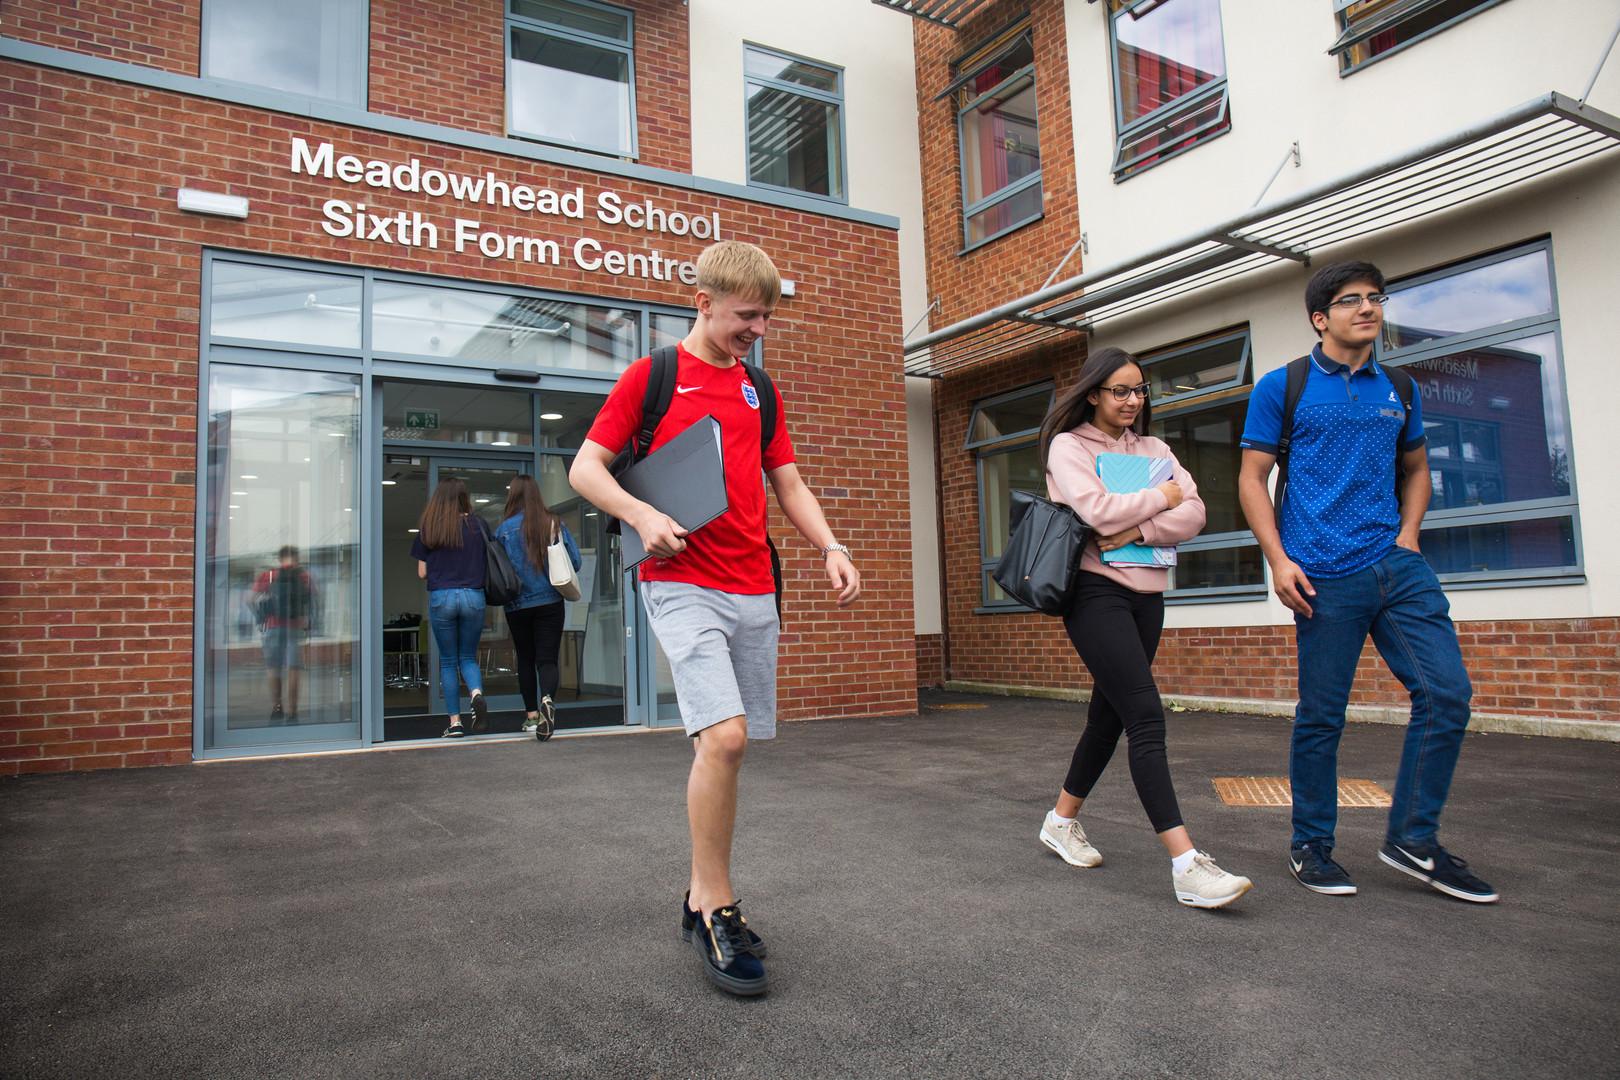 Meadowhead school, school, high school, secondary school, school photographer